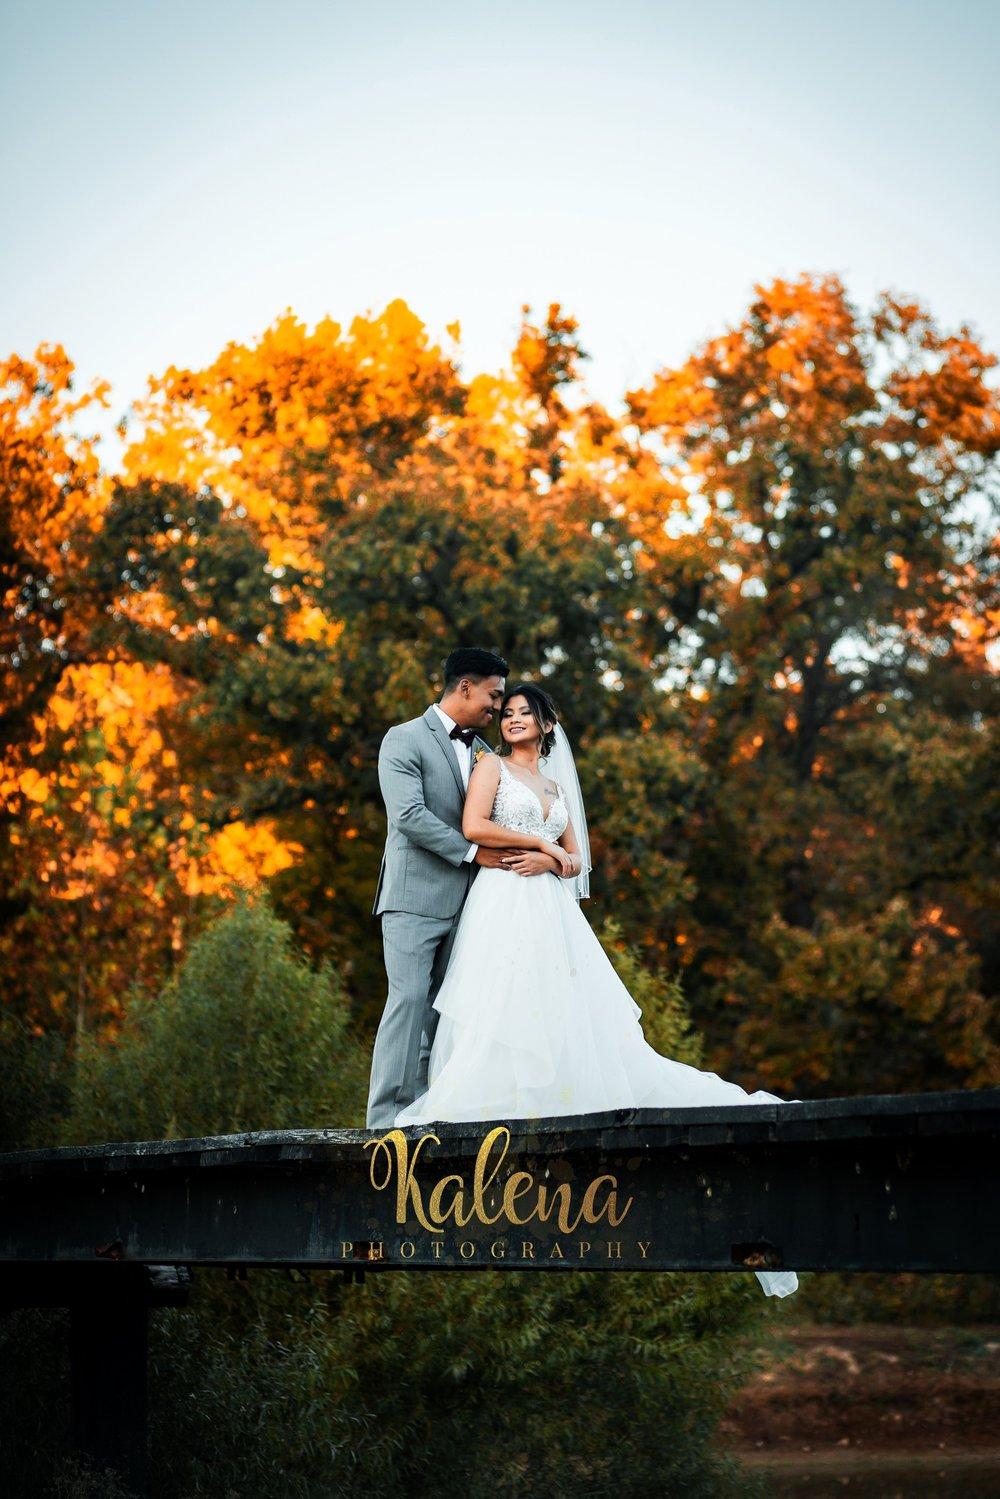 Lost Hill Lake Styled Shoot - Kalena Photography 2018 (98).jpg